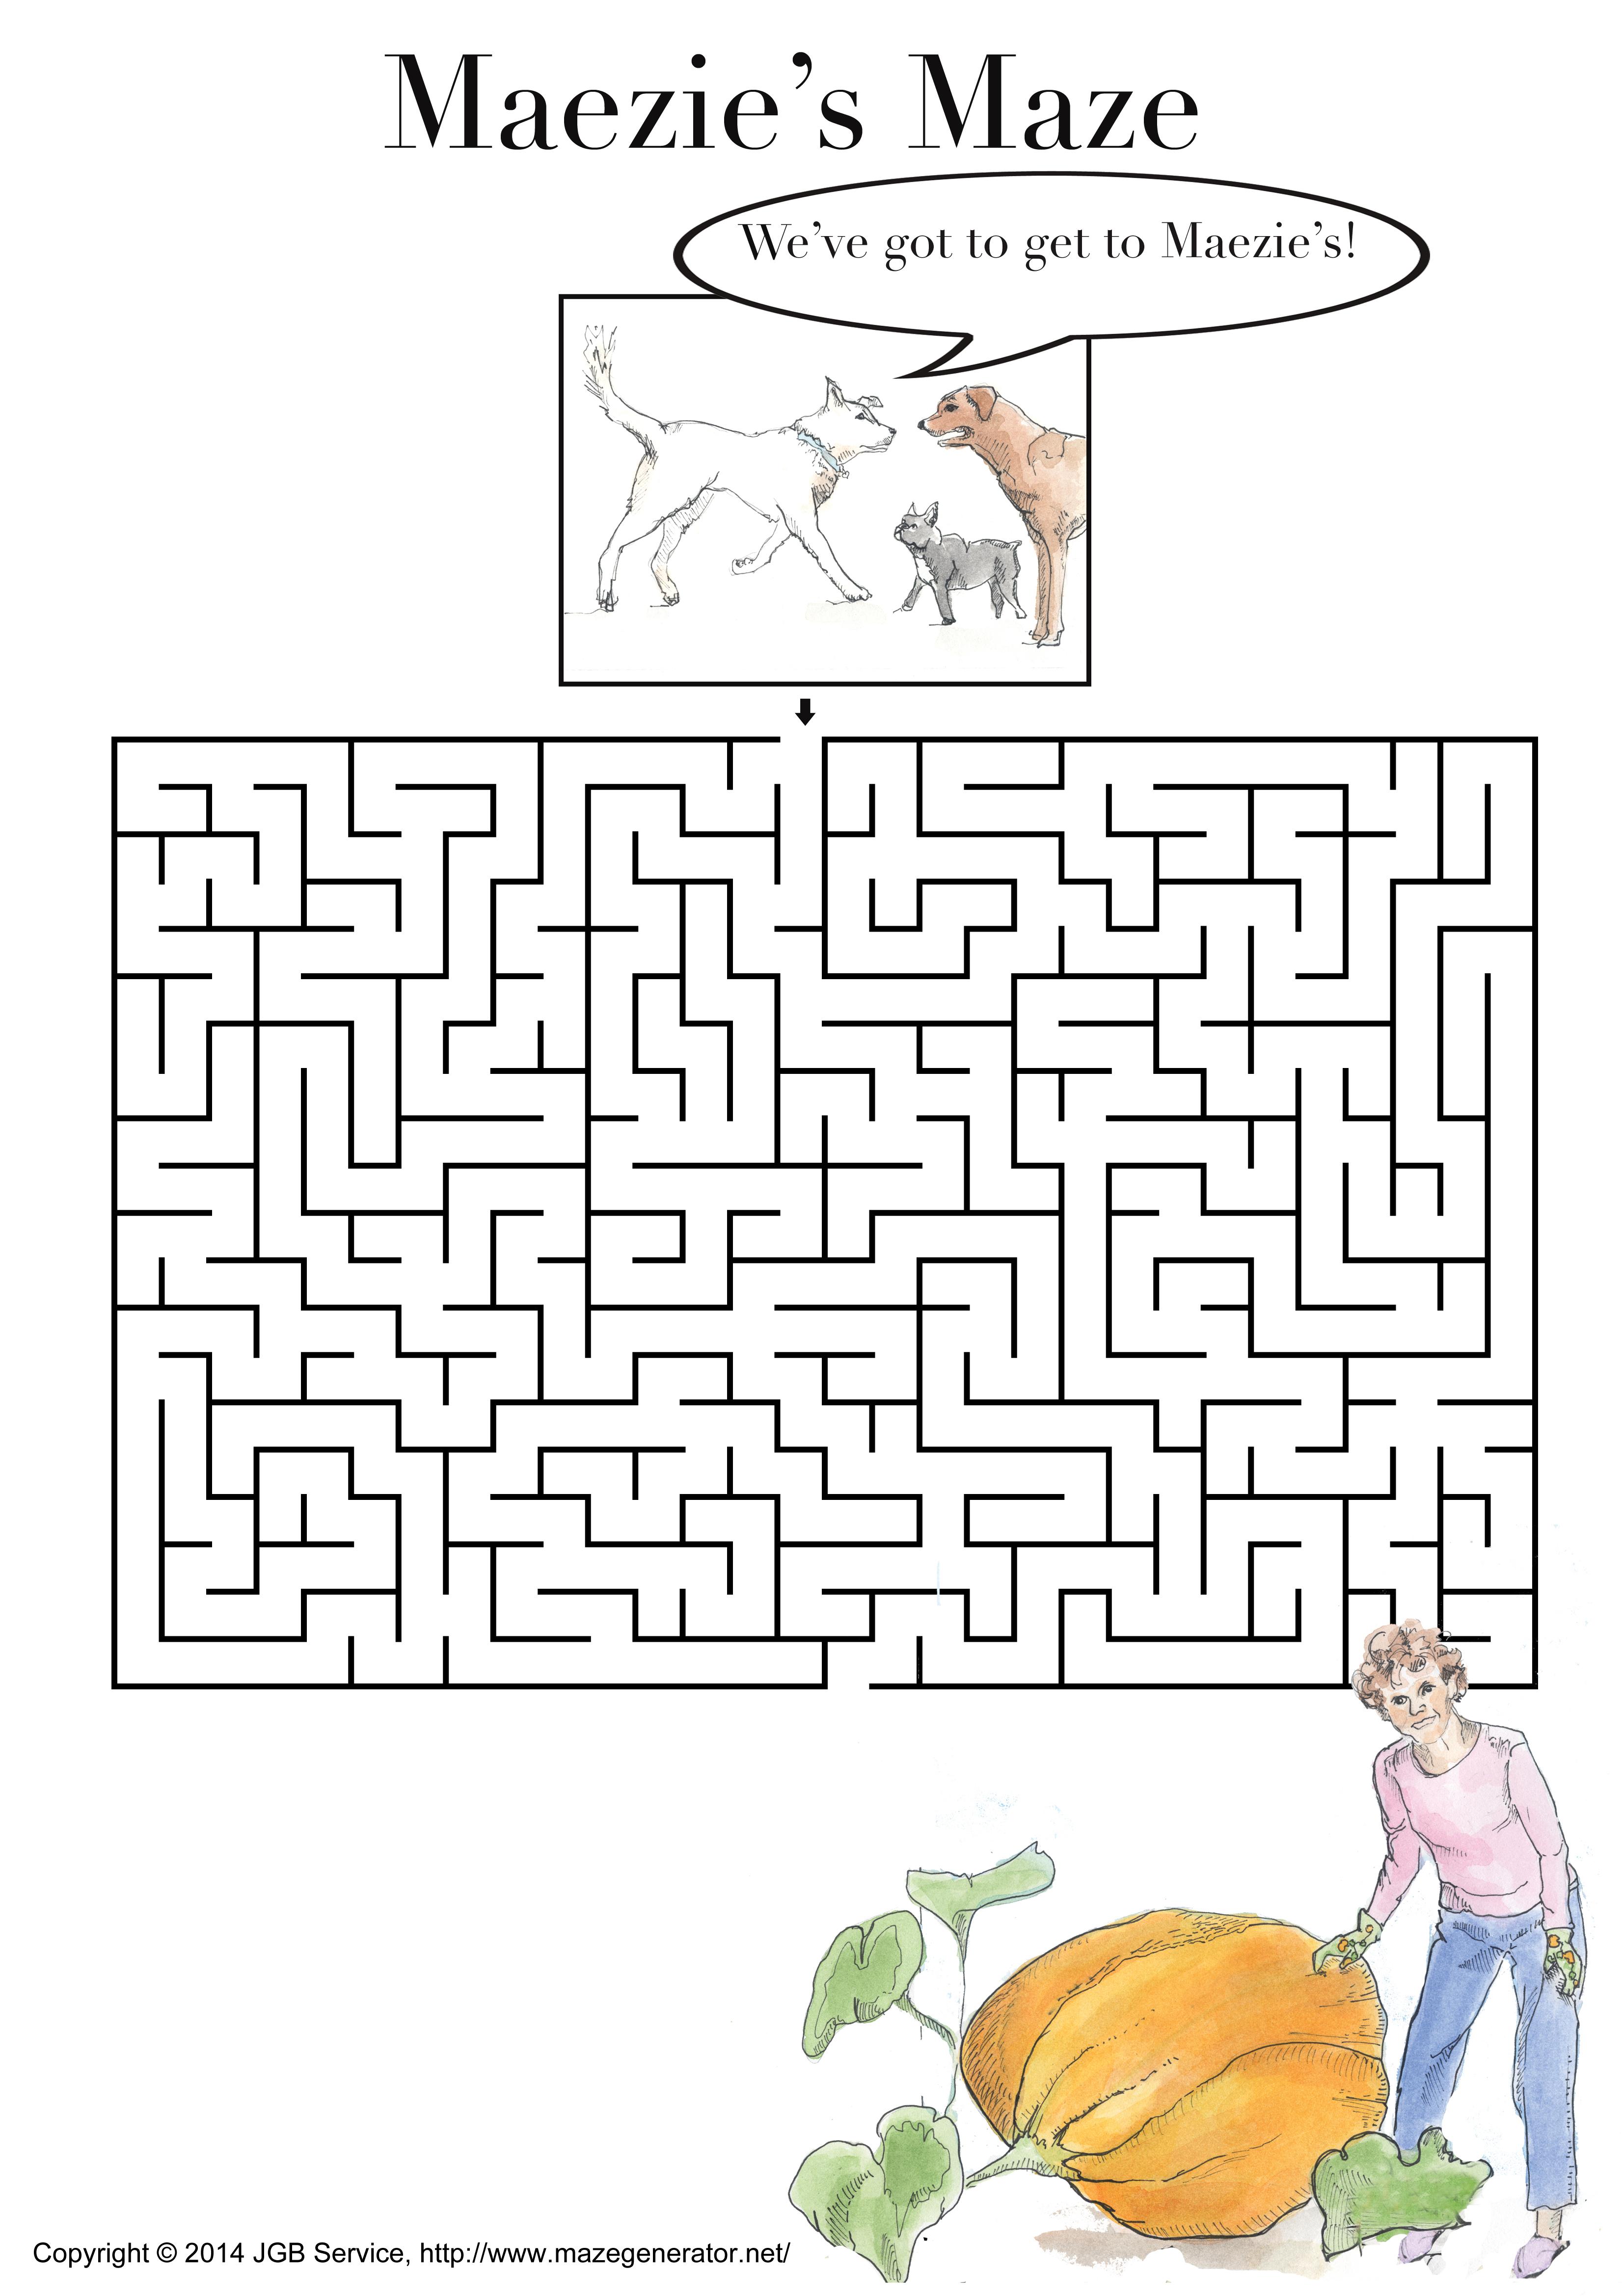 Maezie's Maze